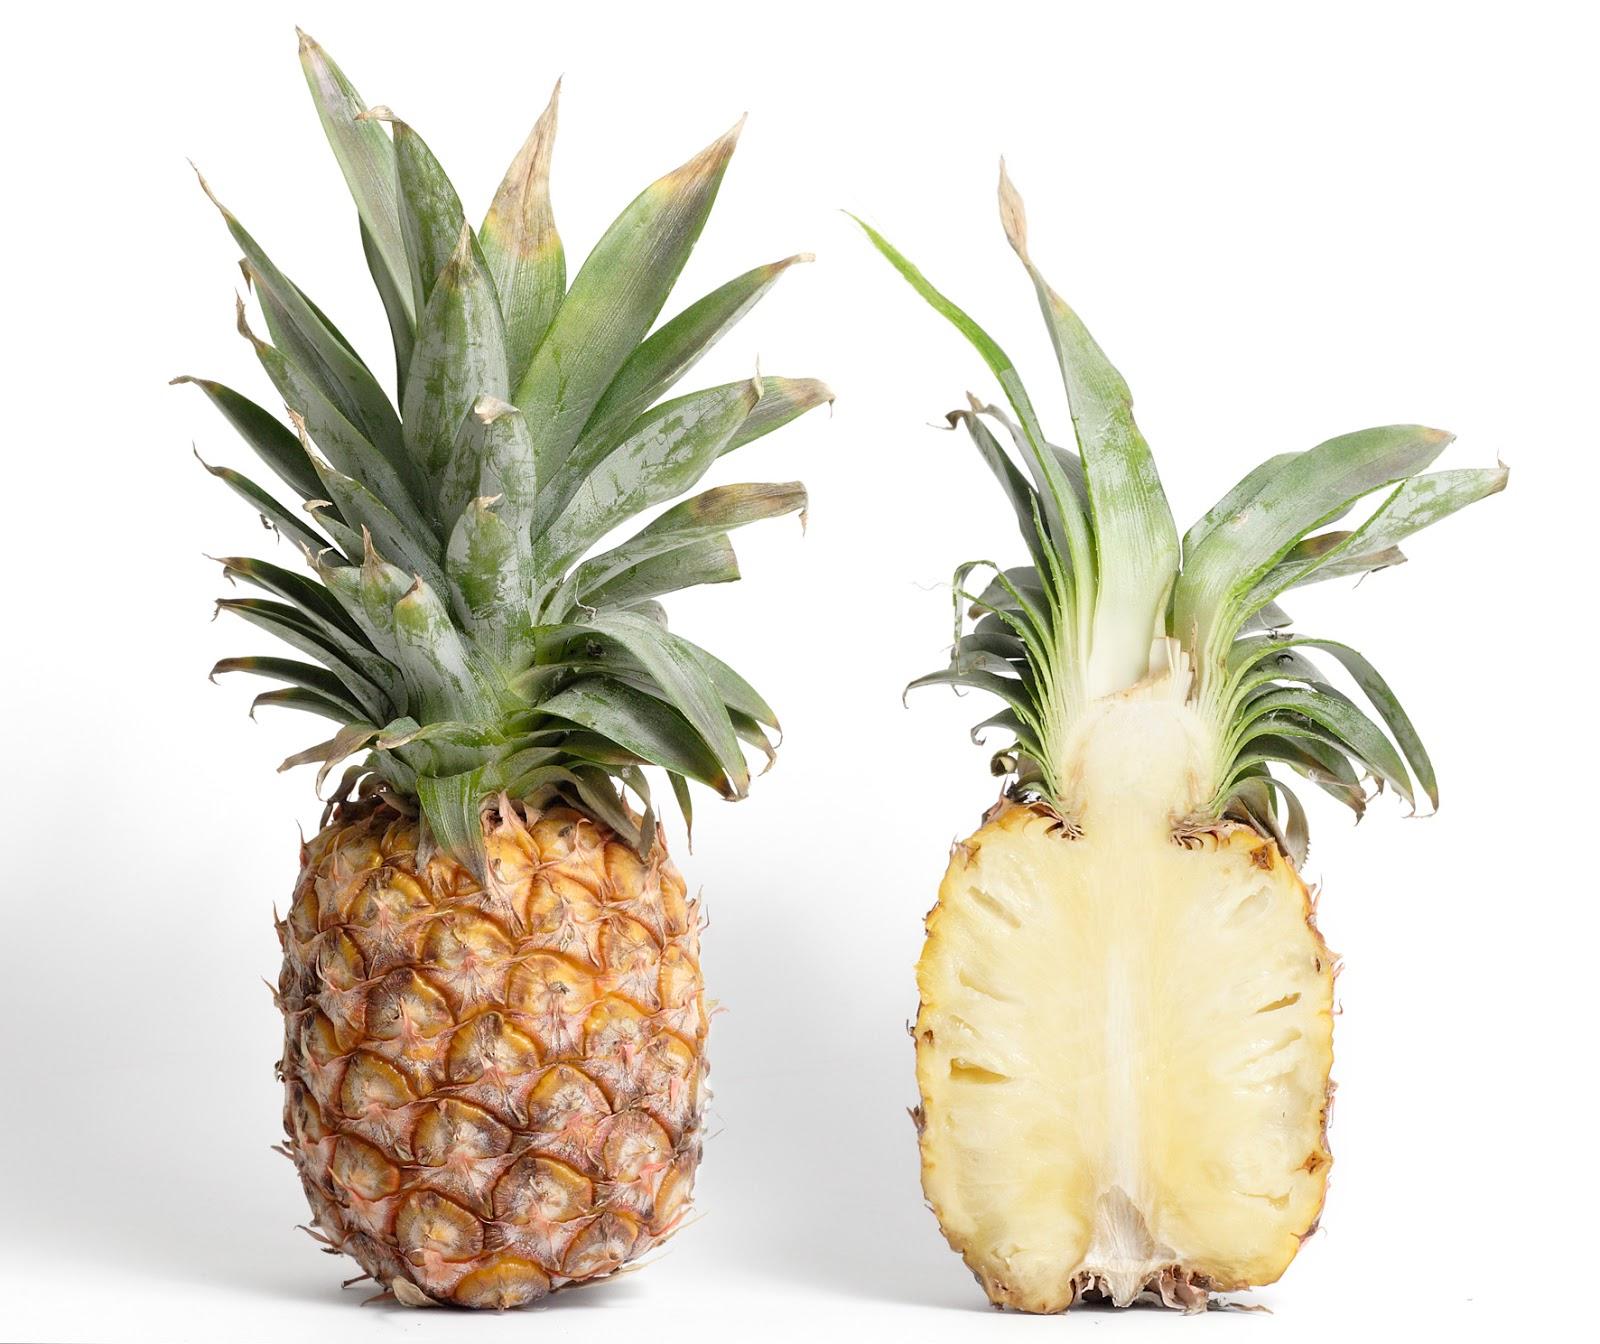 produce clerk the produce clerks handbook by rick chong pineapple overripe yellowing leaves turning brown